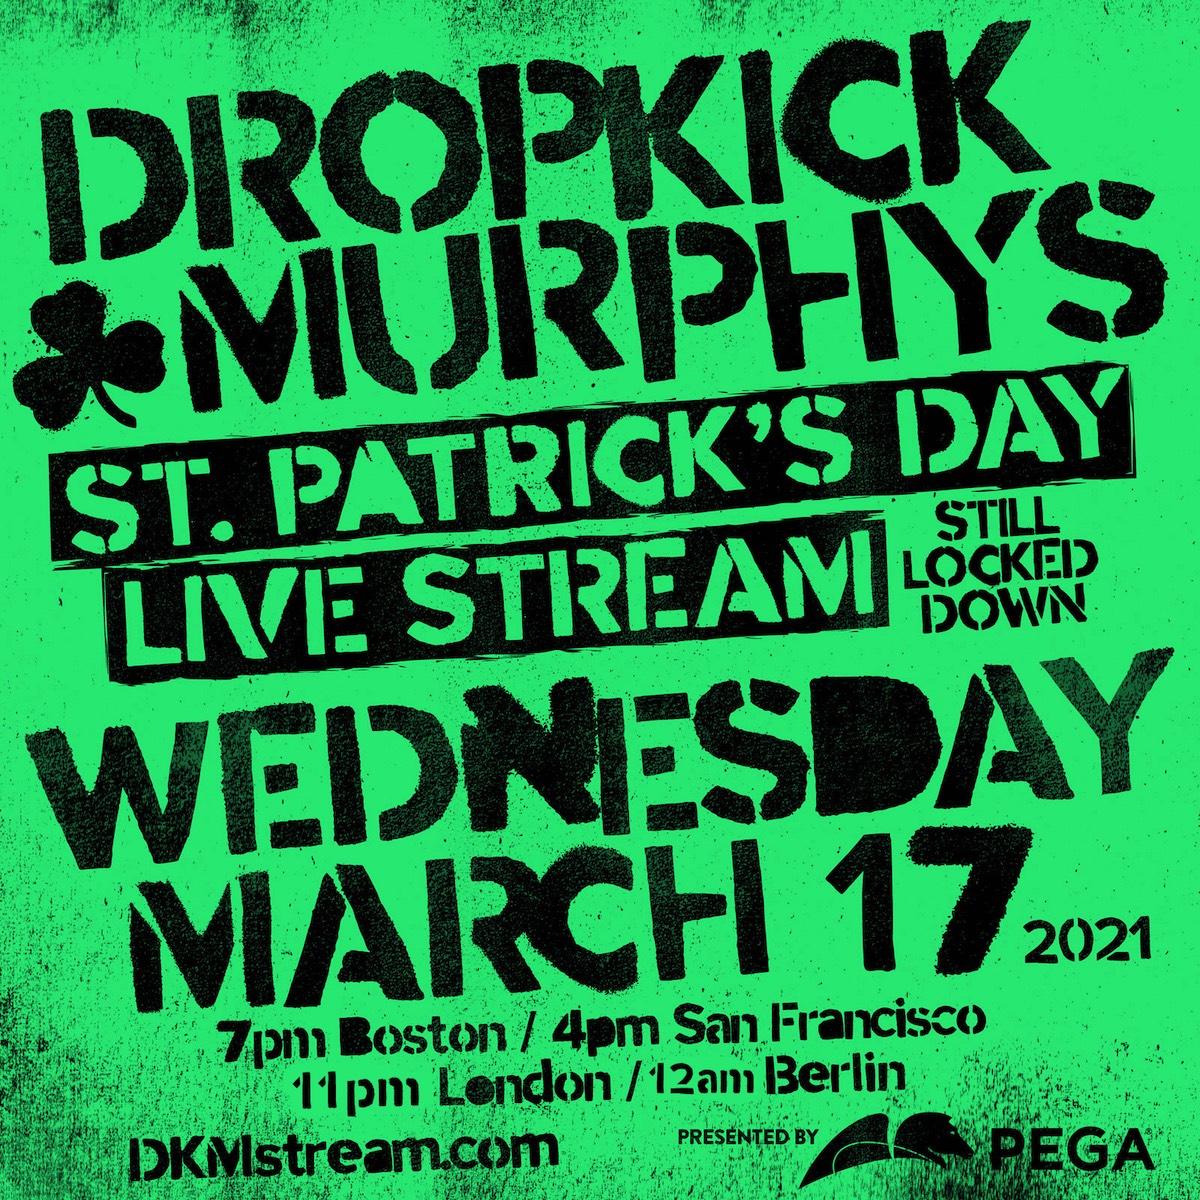 Dropkick Murphys Stream 2021